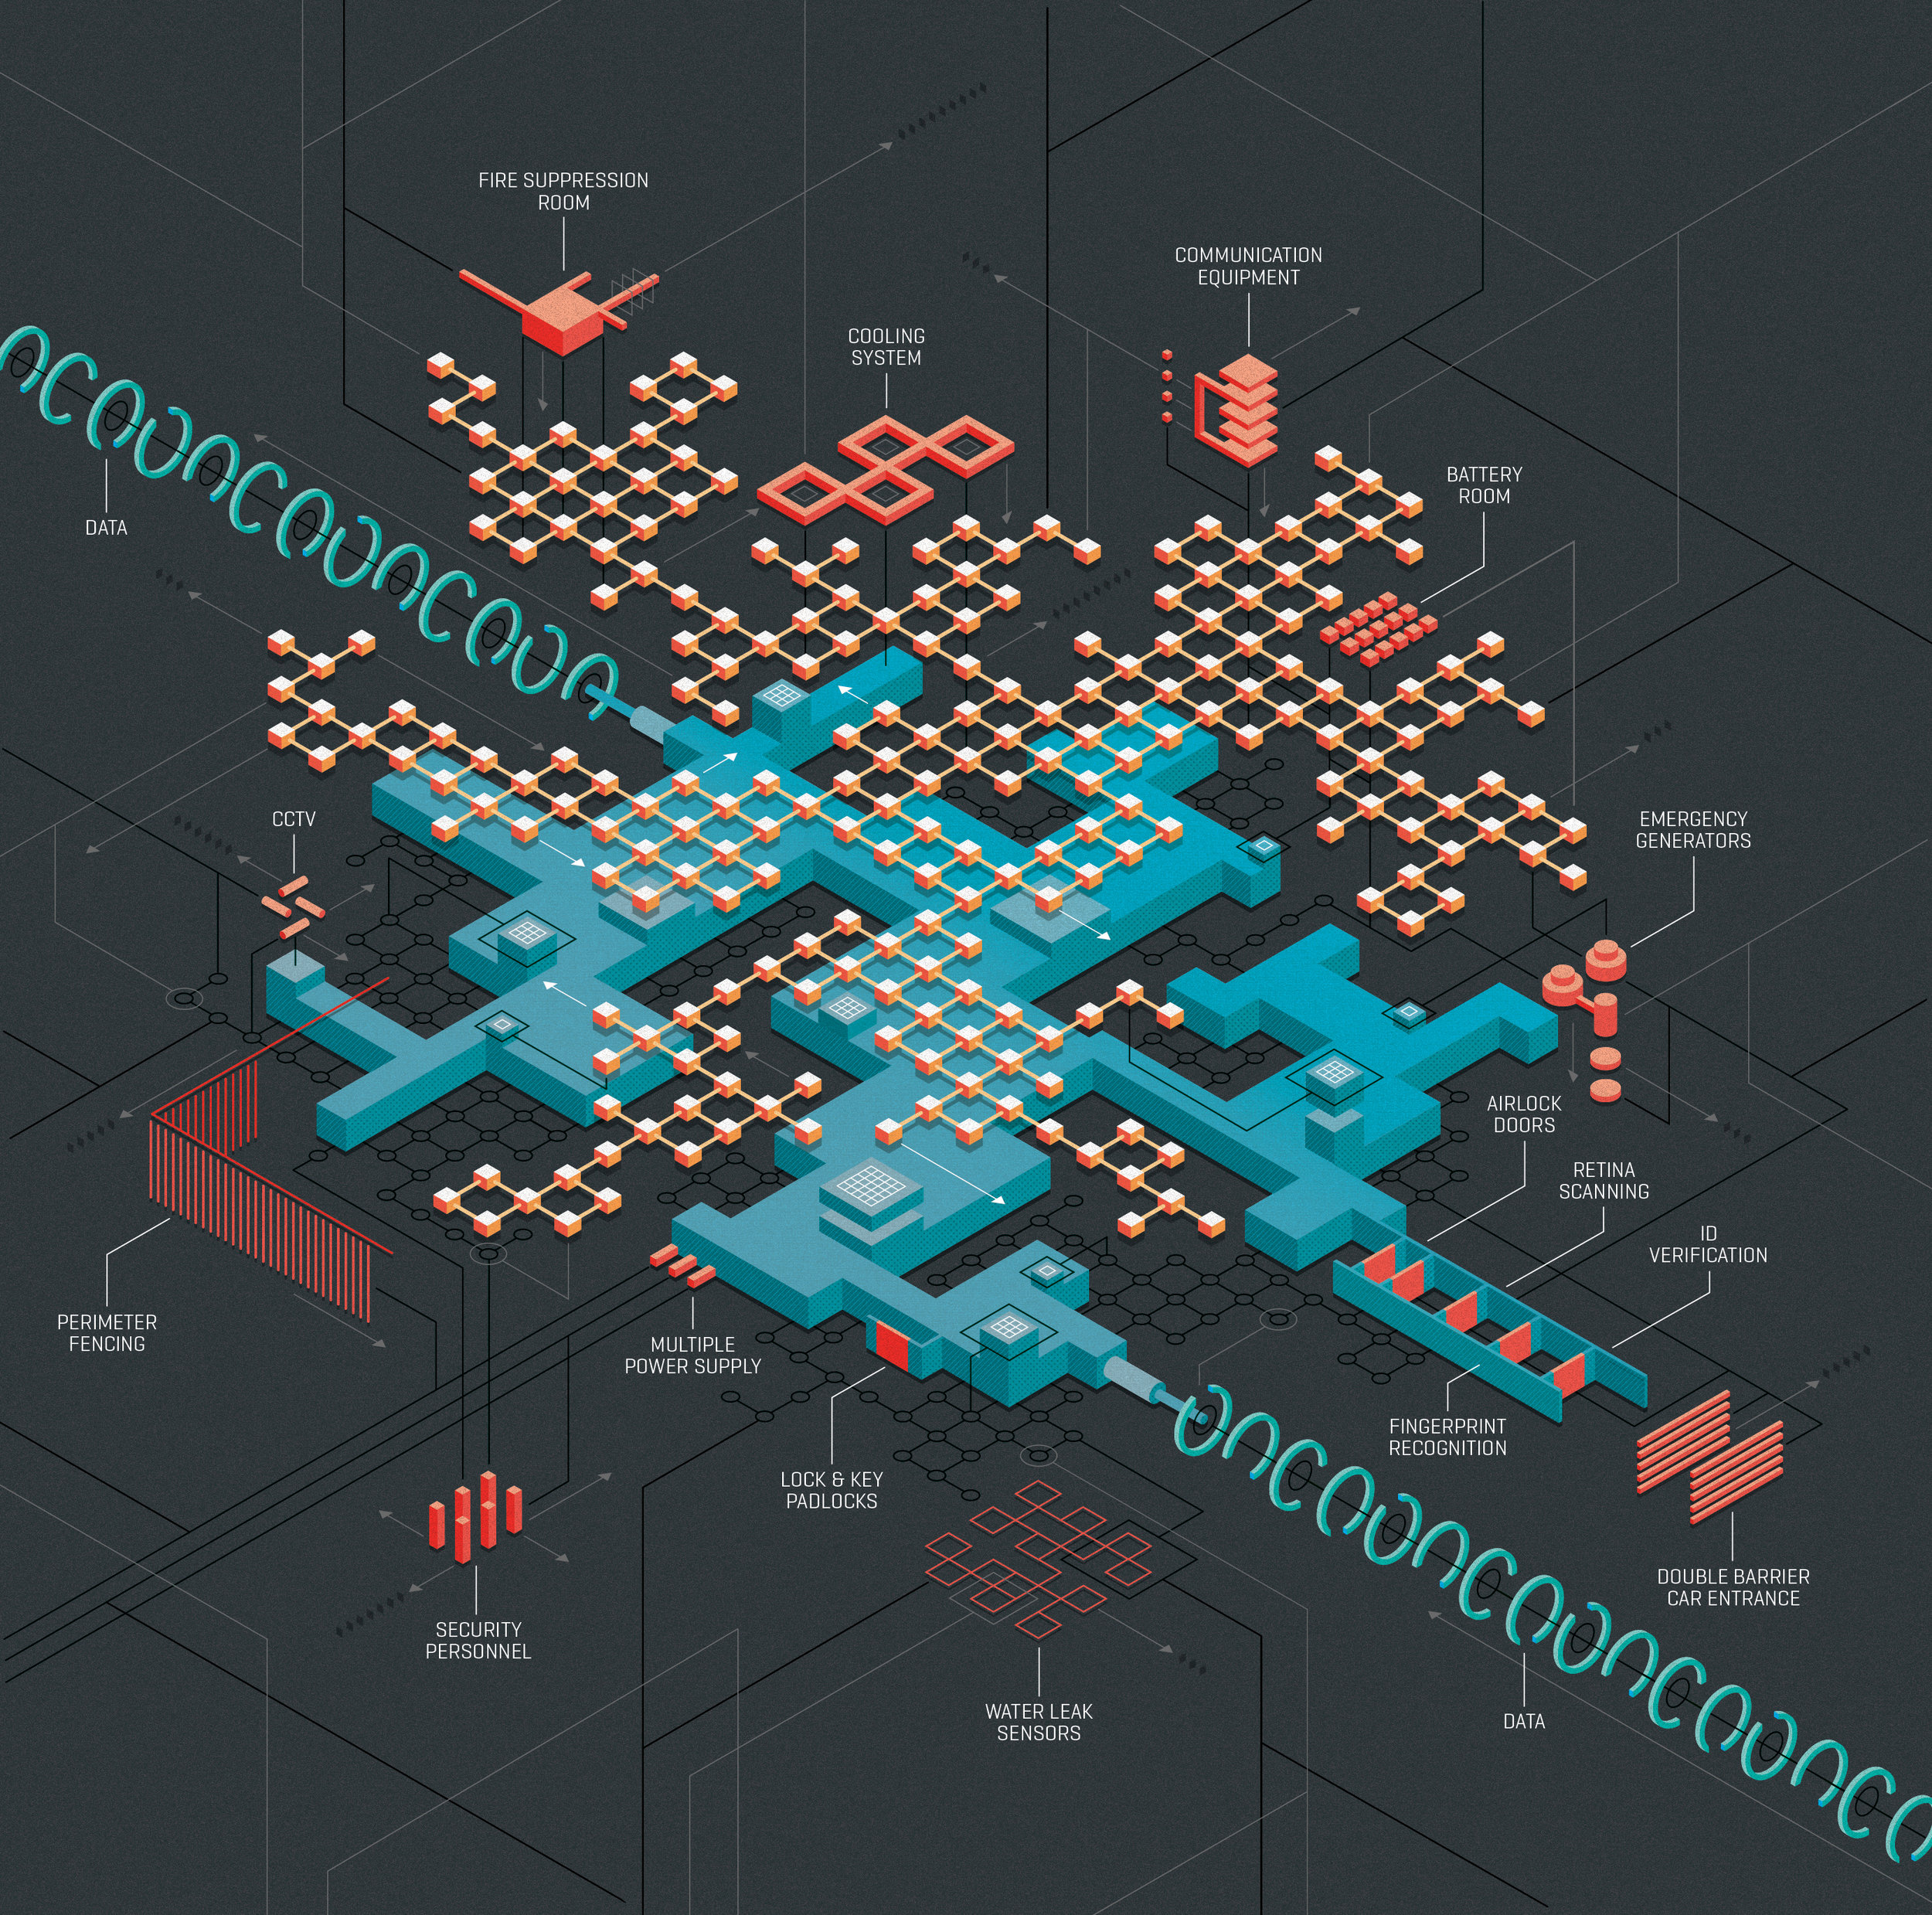 MODUS_DataCentre.jpg